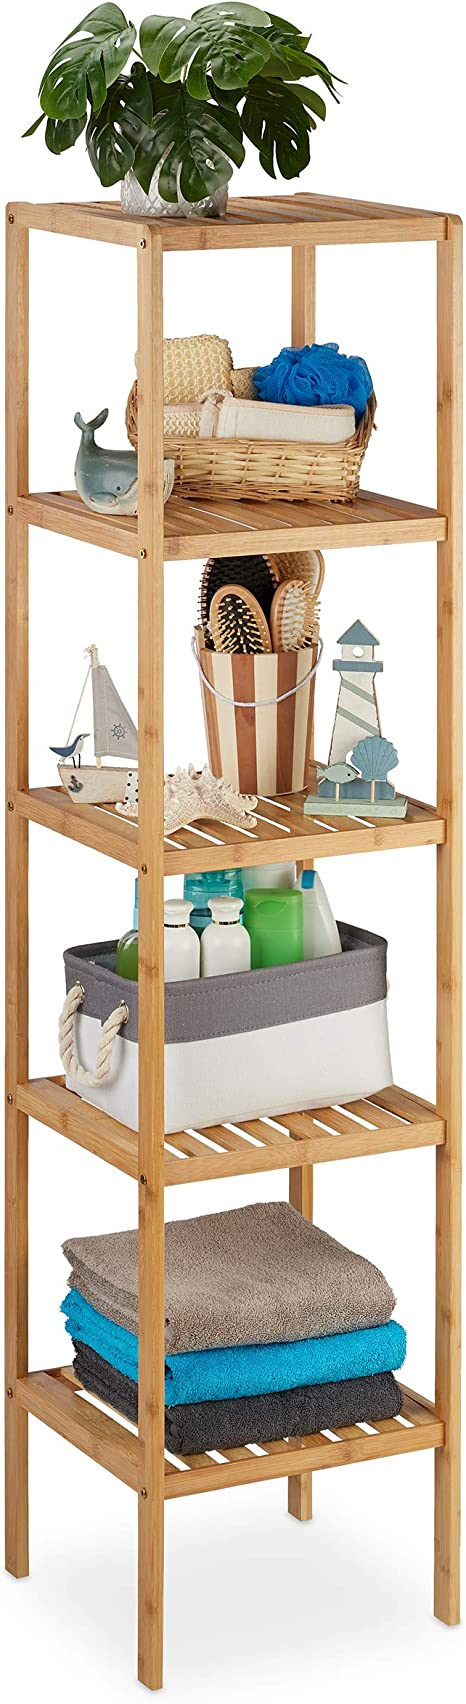 Relaxdays Badregal Bambus, Standregal Badezimmer & Küche ...